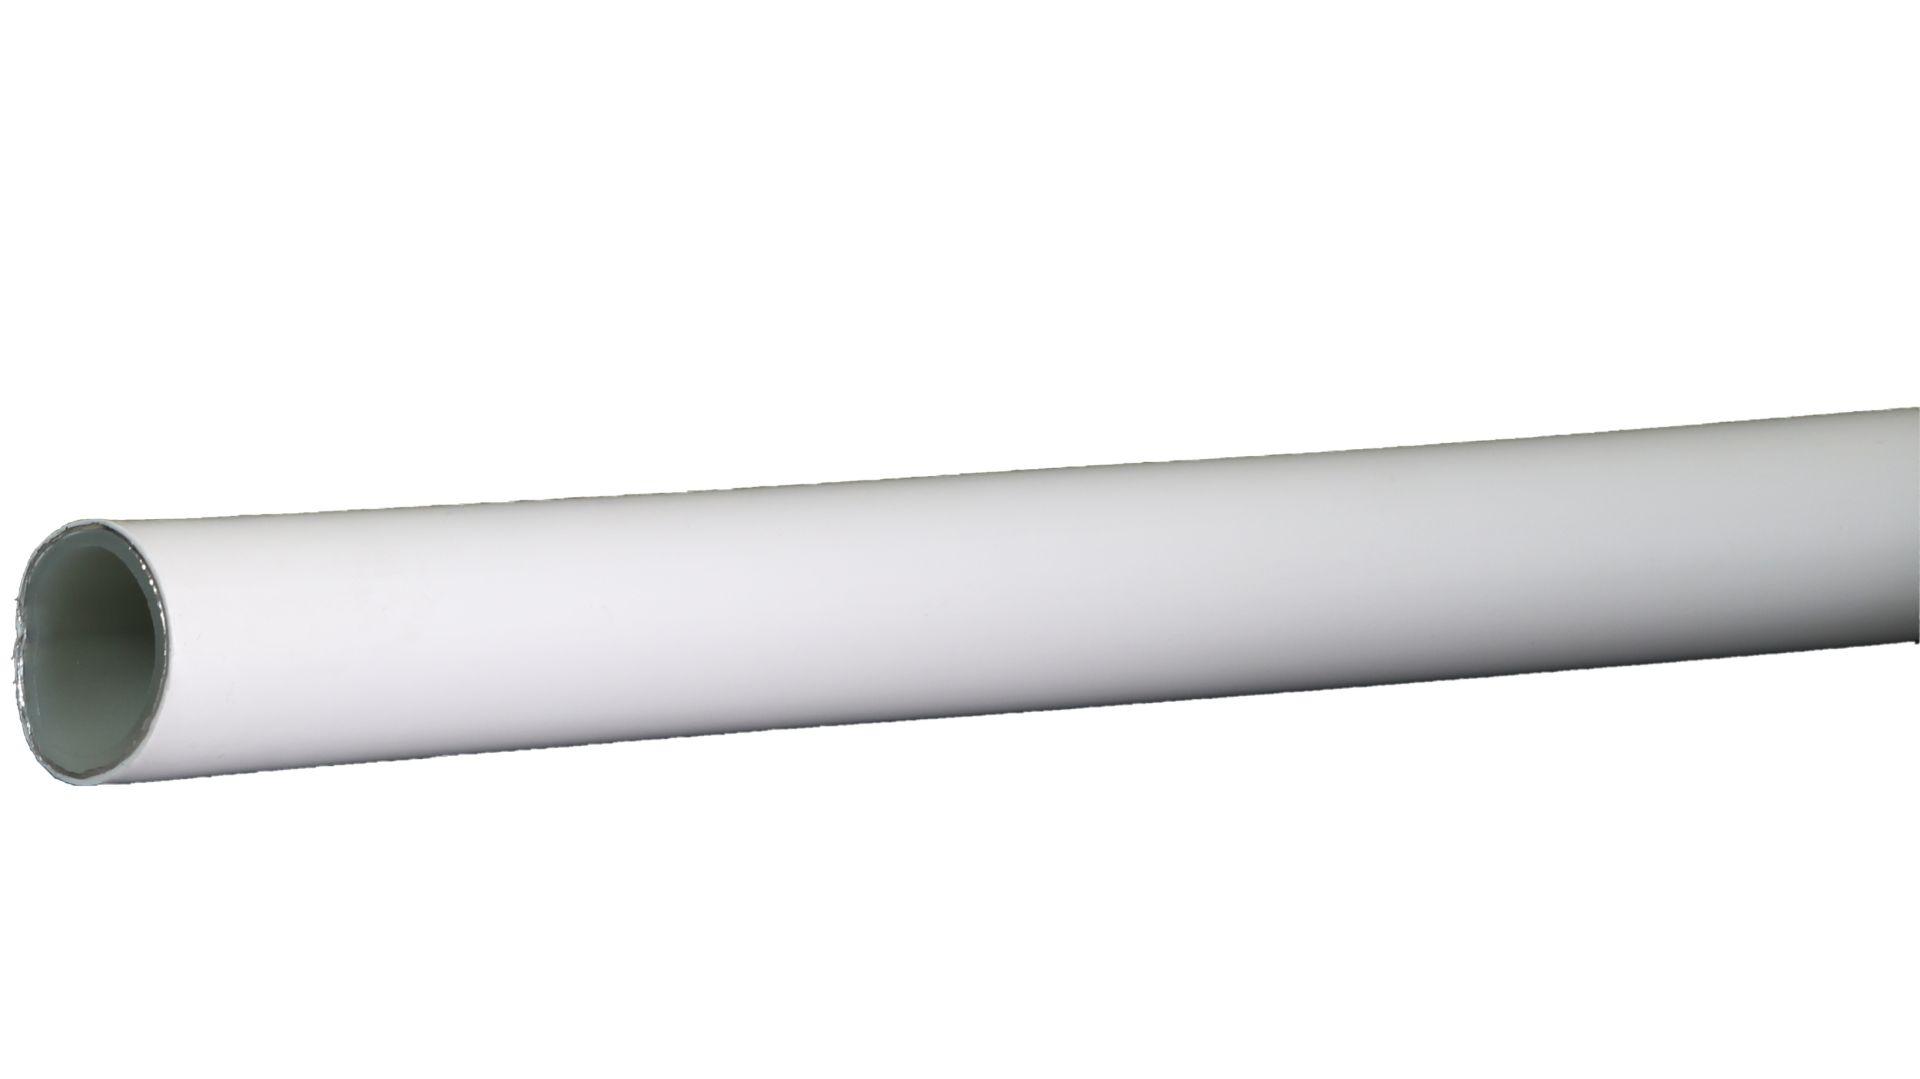 Marley AquaStec (TW) Alu-Verbundrohr 16 x 2 mm, 25 m